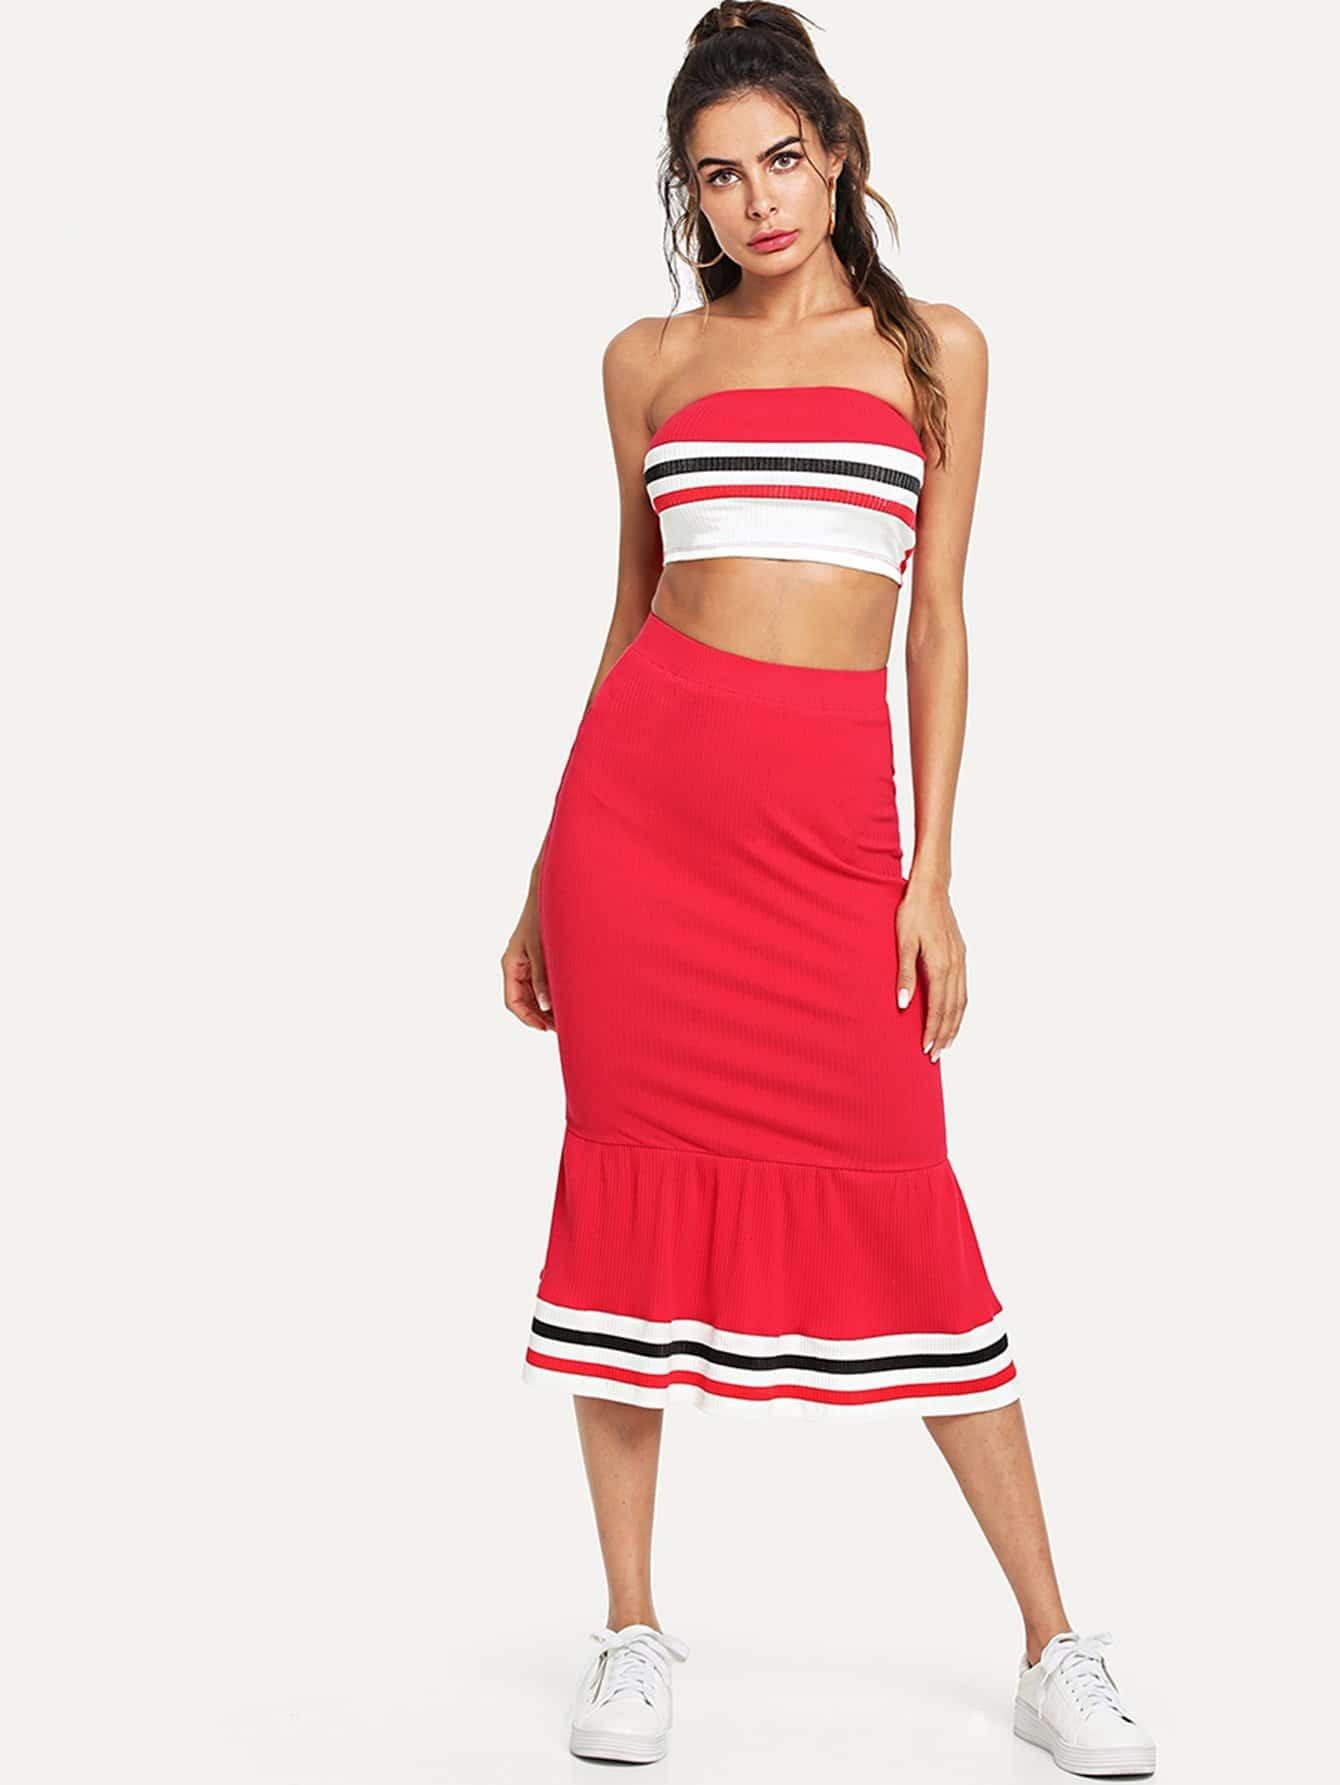 Striped Print Rib Knit Bandeau Top and Ruffle Hem Skirt Set ruffle shoulder rib knit peplum top